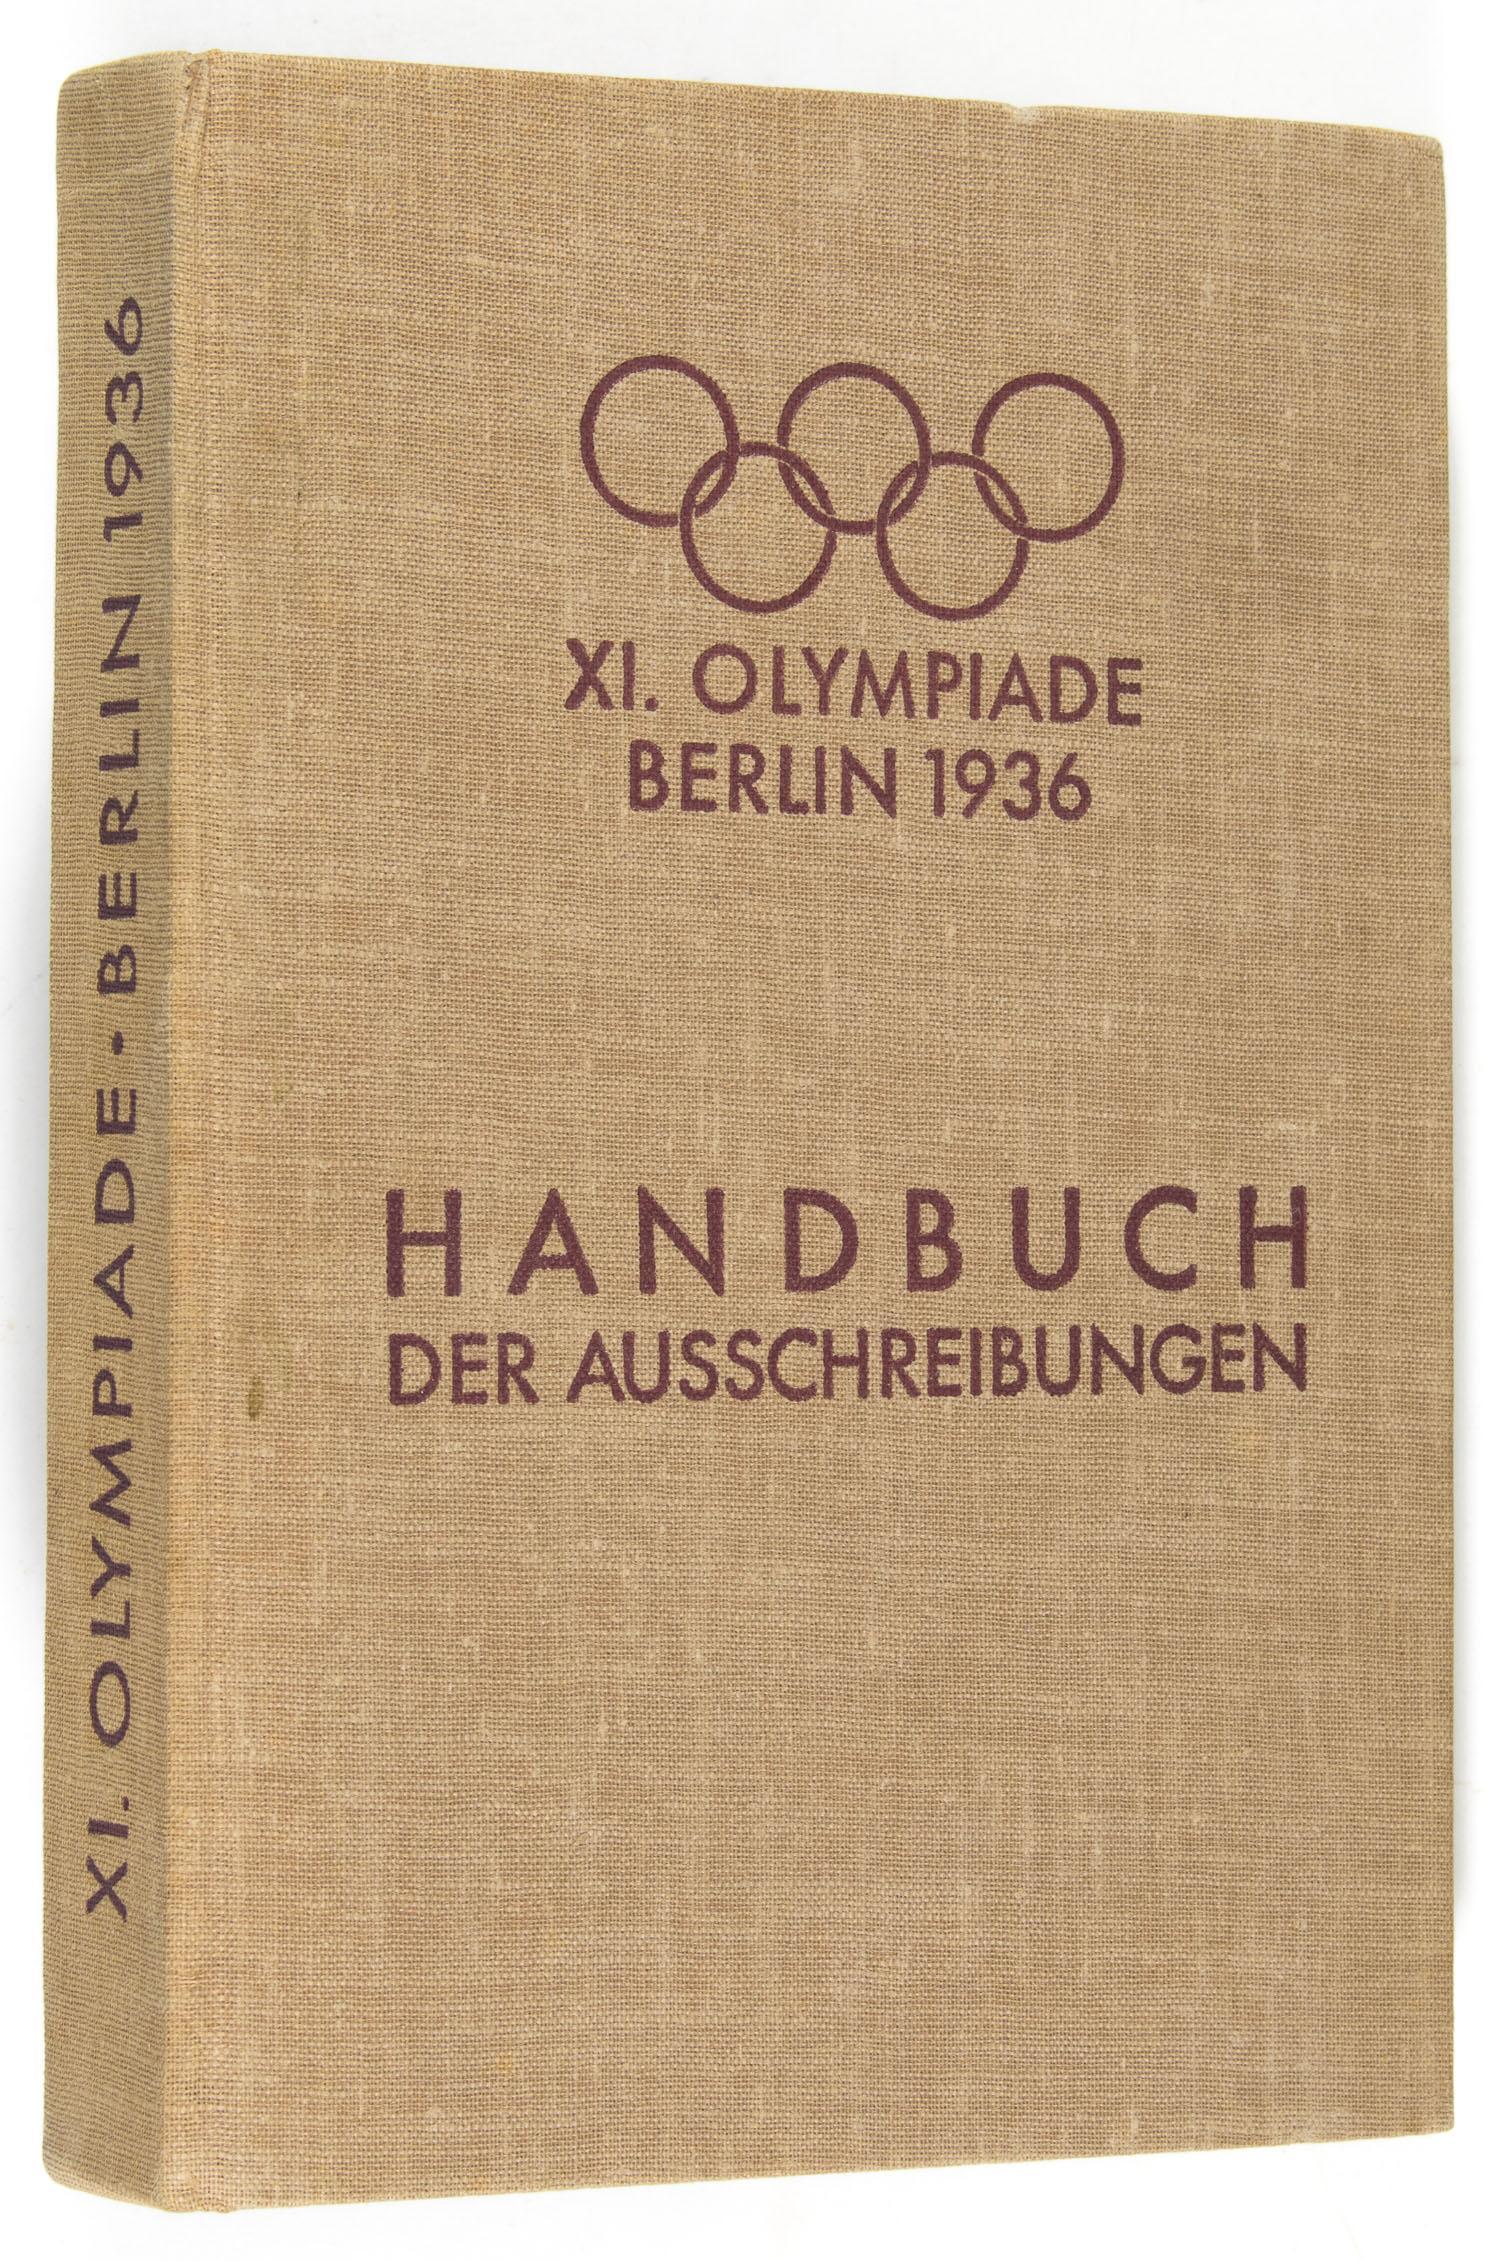 1936 BERLIN OLYMPICS REGULATIONS BOOK